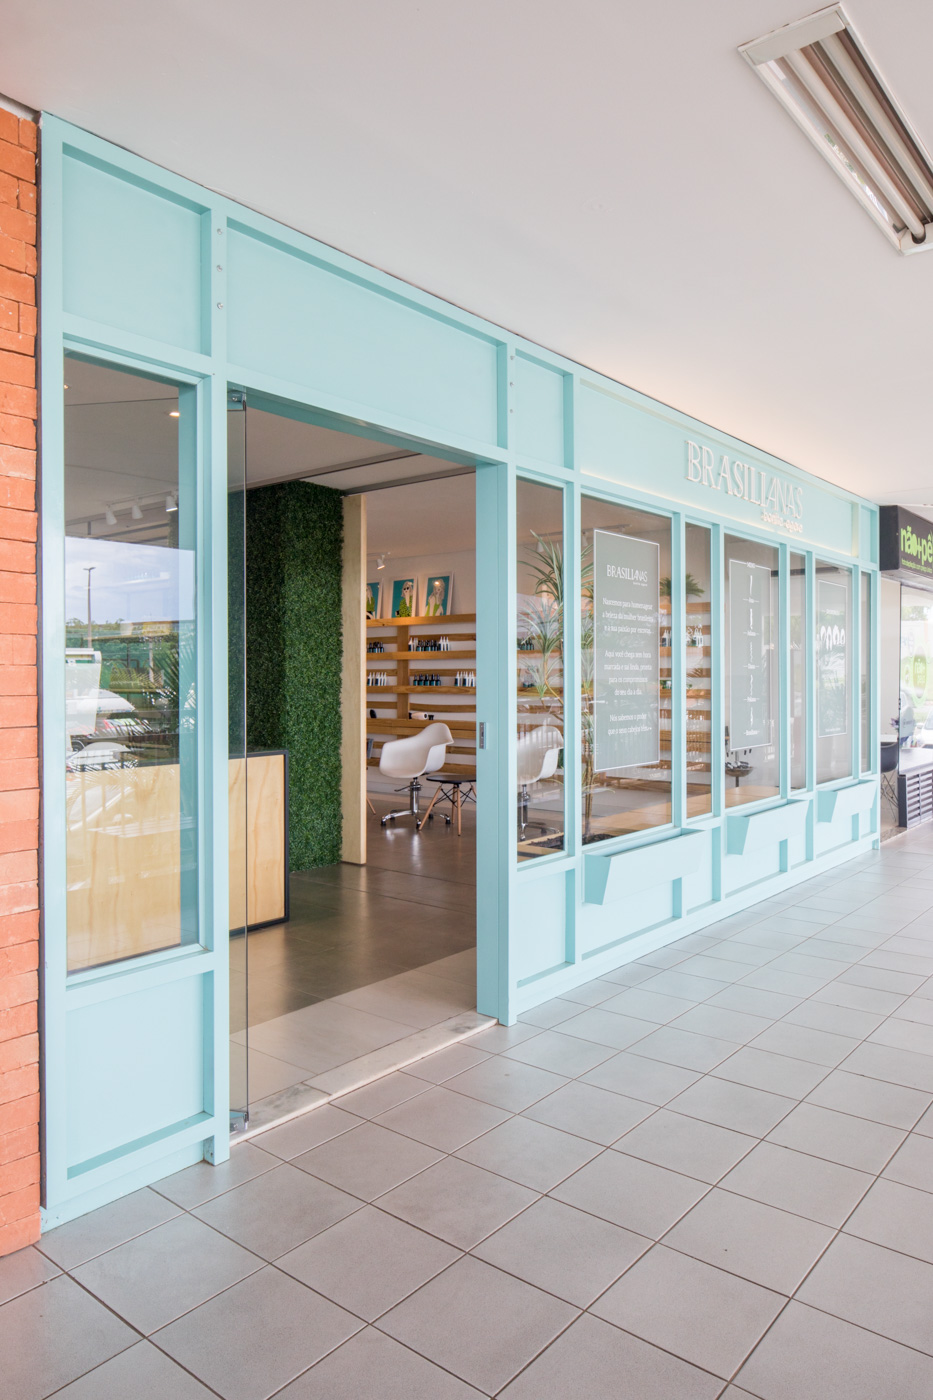 Estúdio-Mova-arquitetura-interiores-comercial-foto-haruo-mikami_168_Baixa.jpg